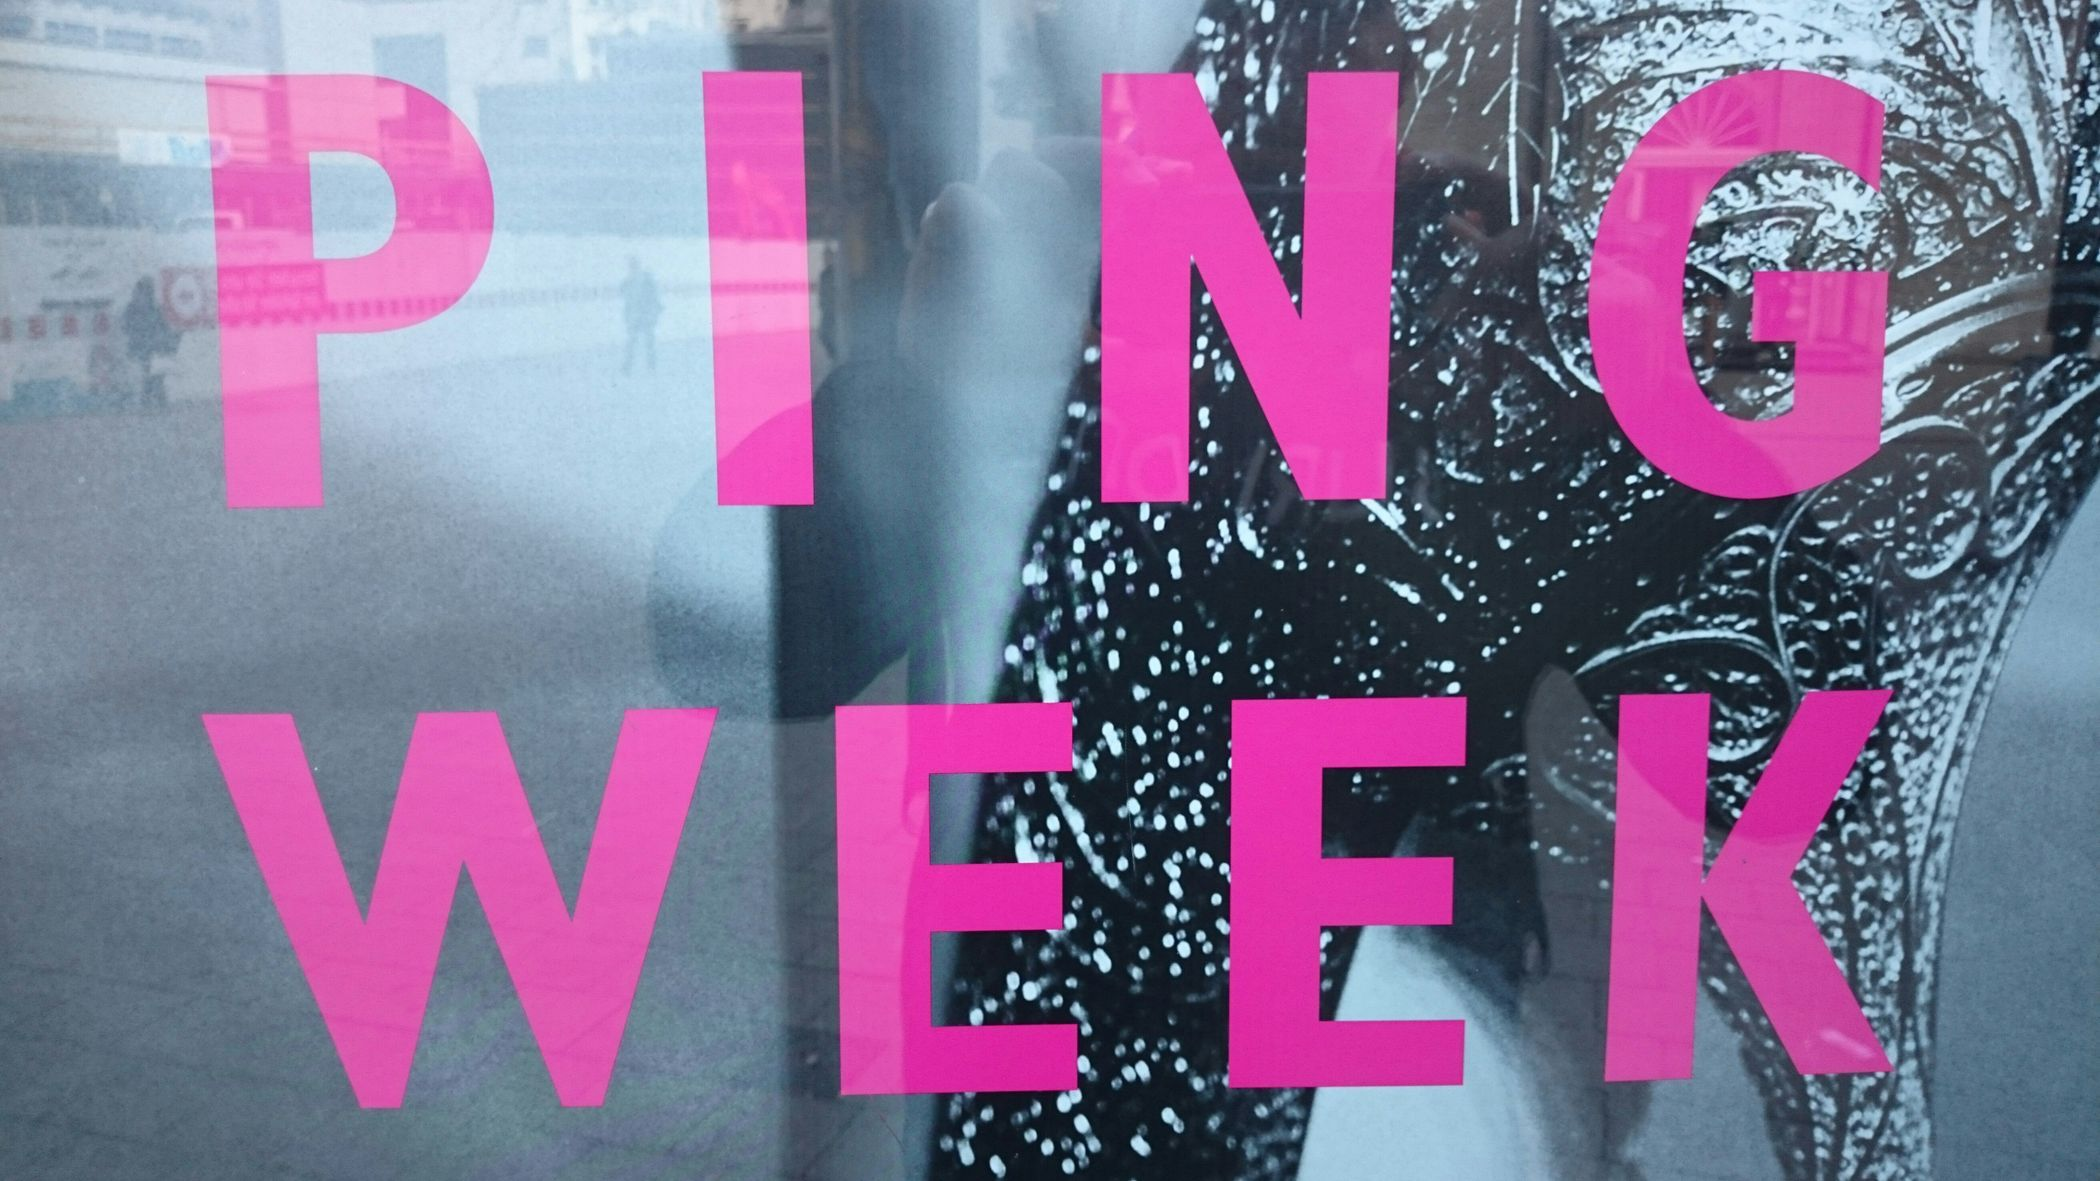 So why not anouncing the offical PING WEEK? Hamburg Ping Week Windows Show Room Week